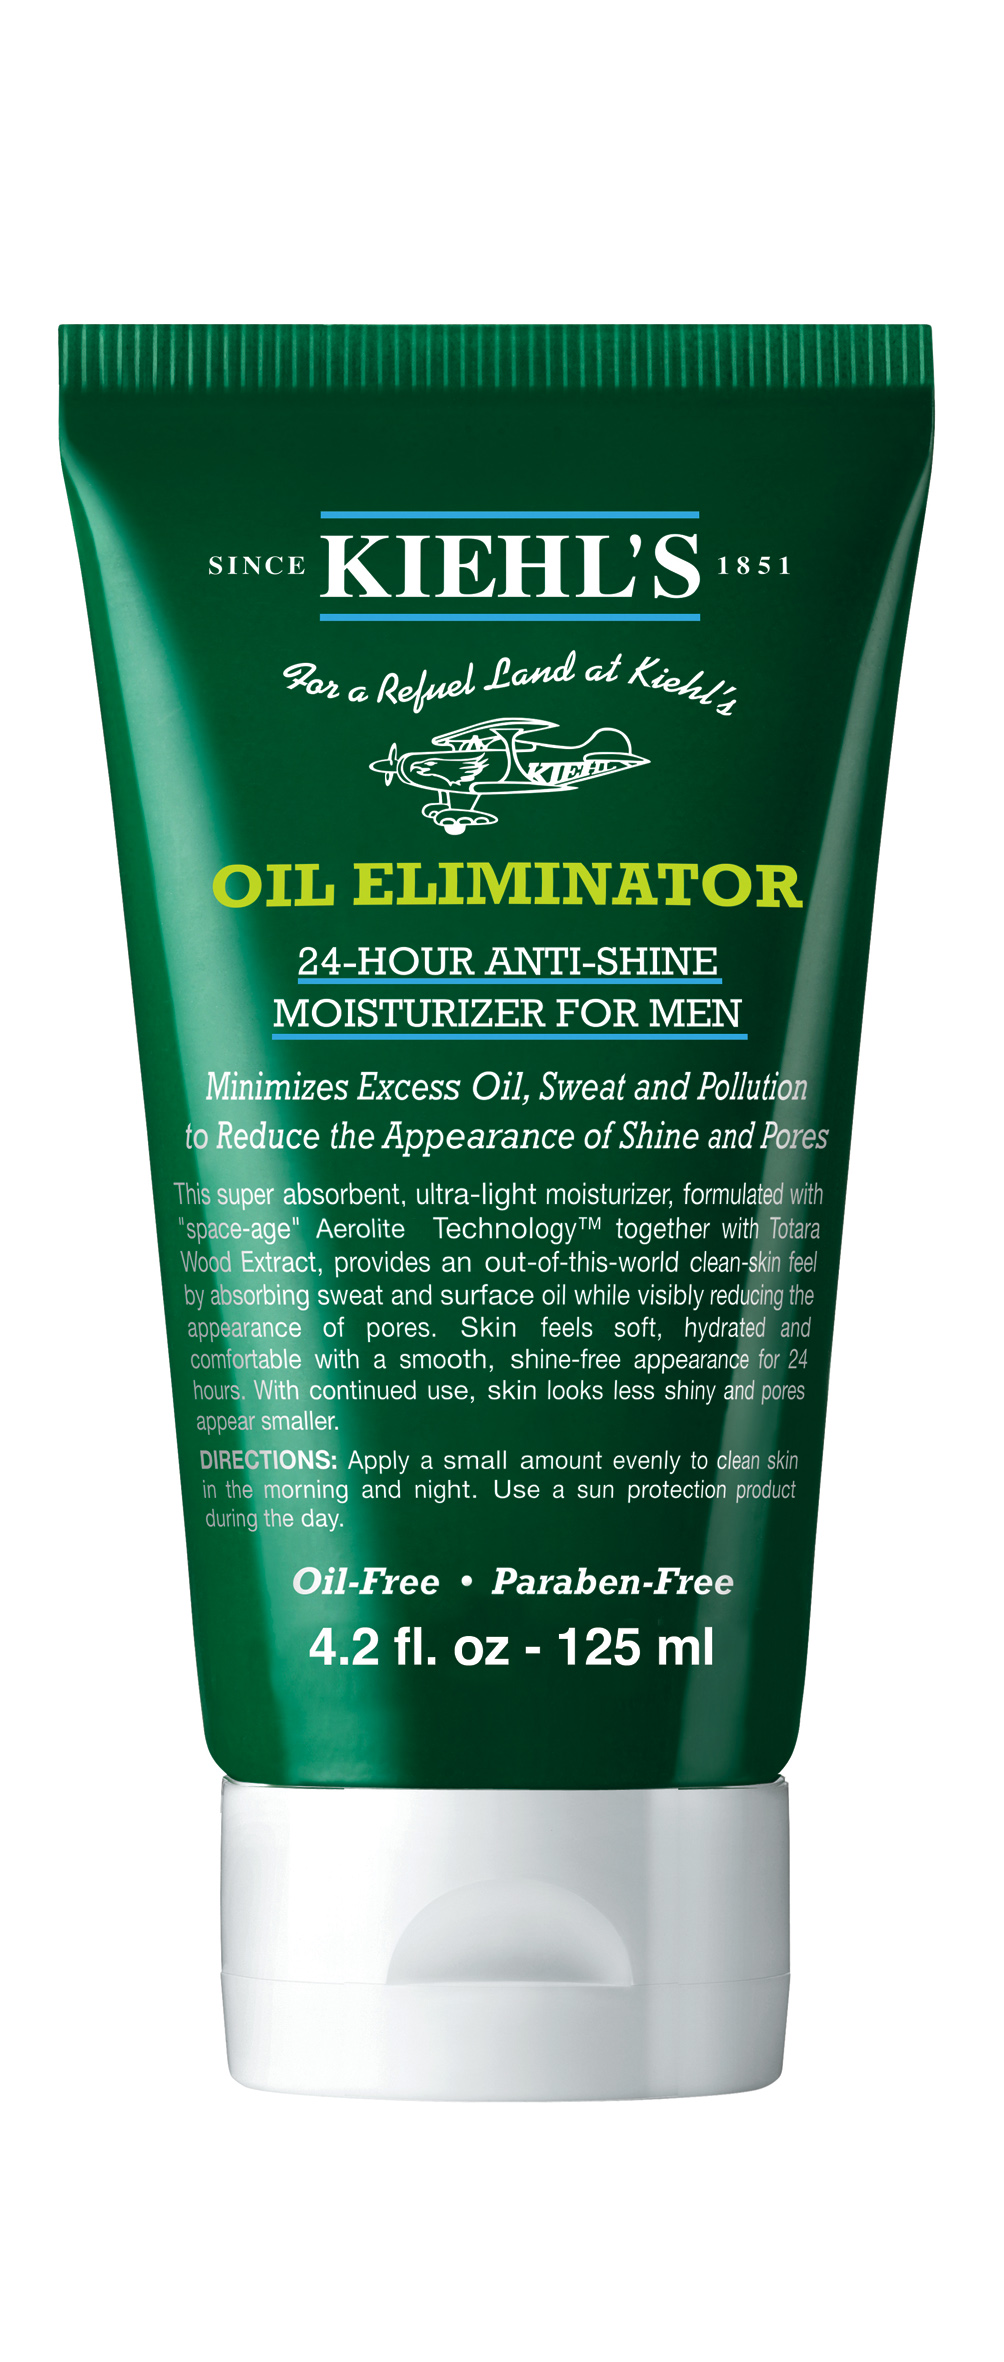 Oil Eliminator